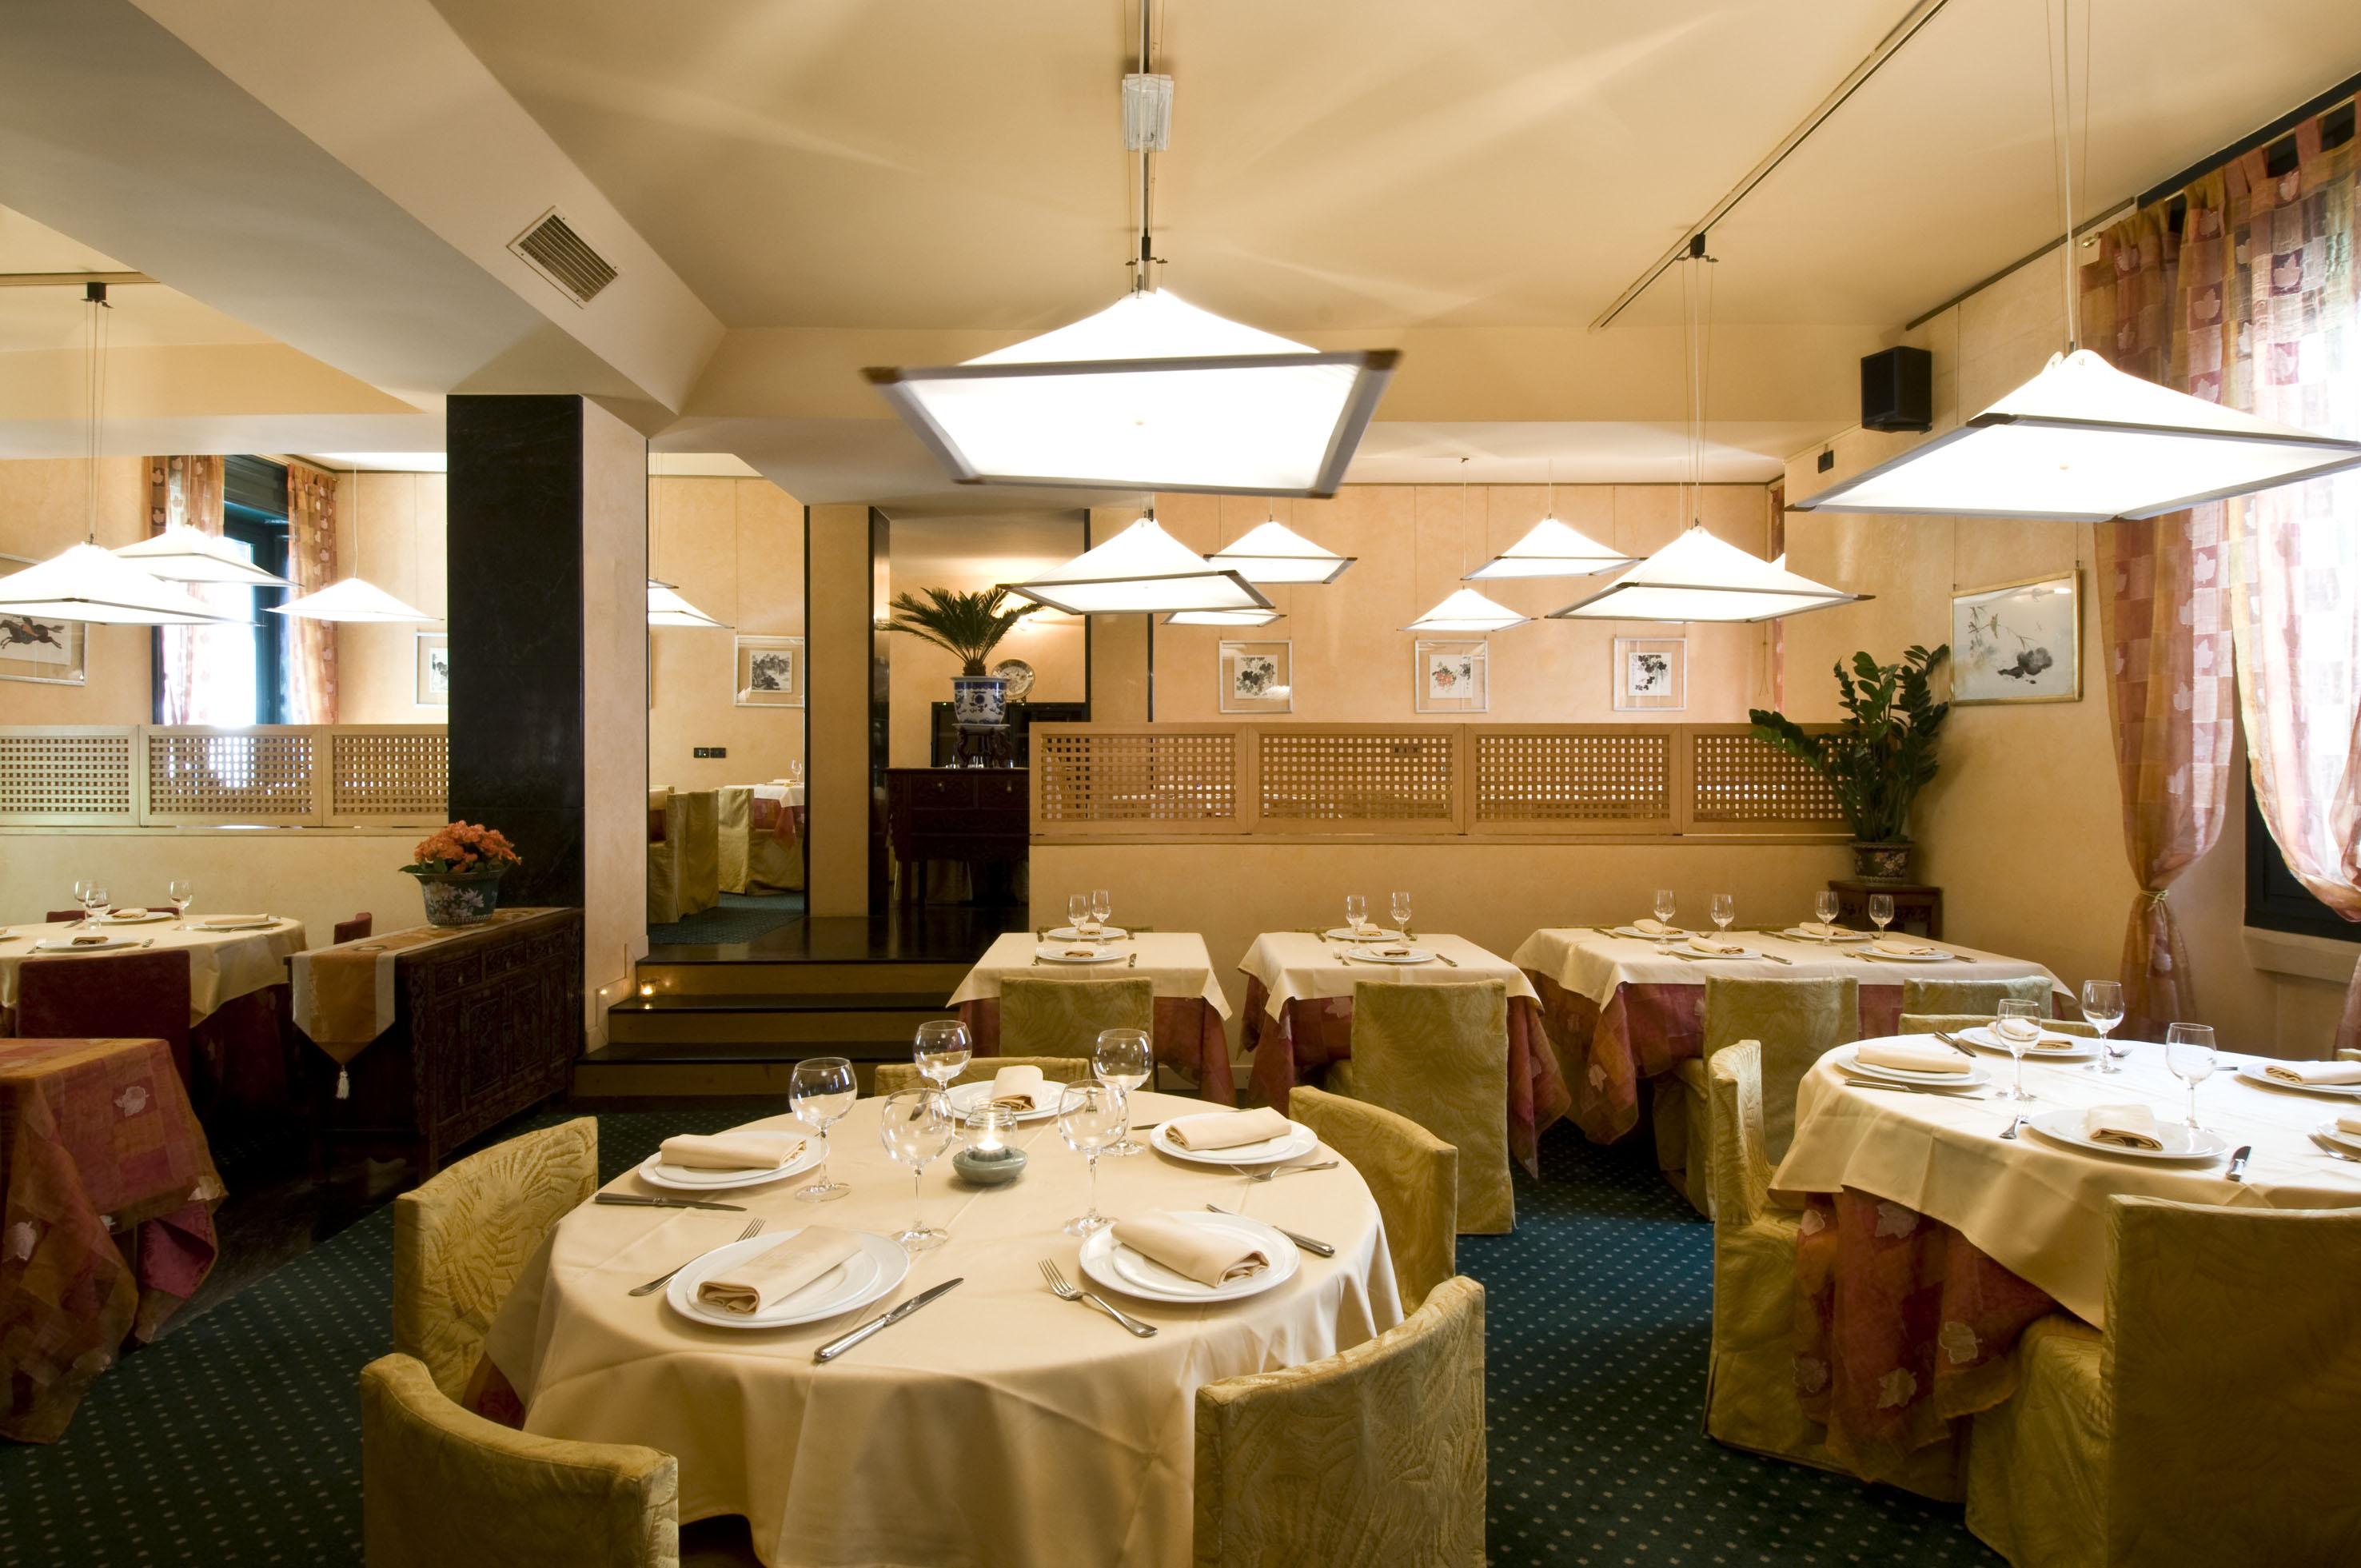 giardino di giada milano ristorante cinese a due passi dal duomo